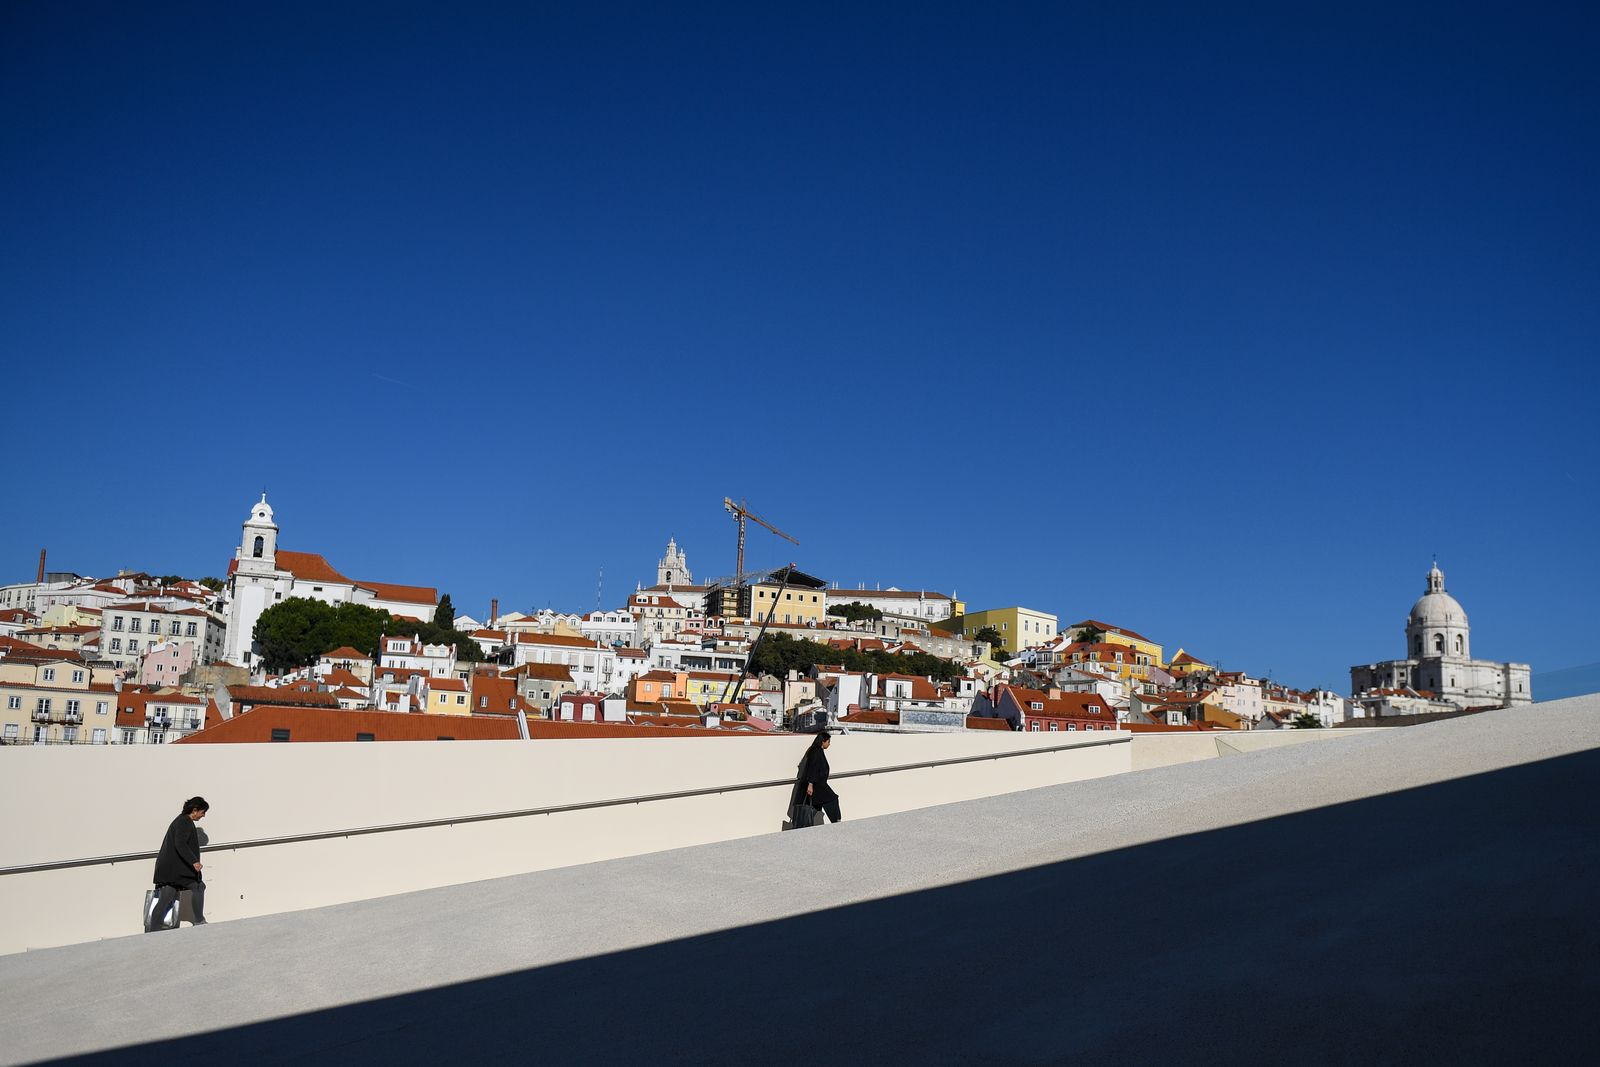 Lissabon / Kreuzfahrtterminal